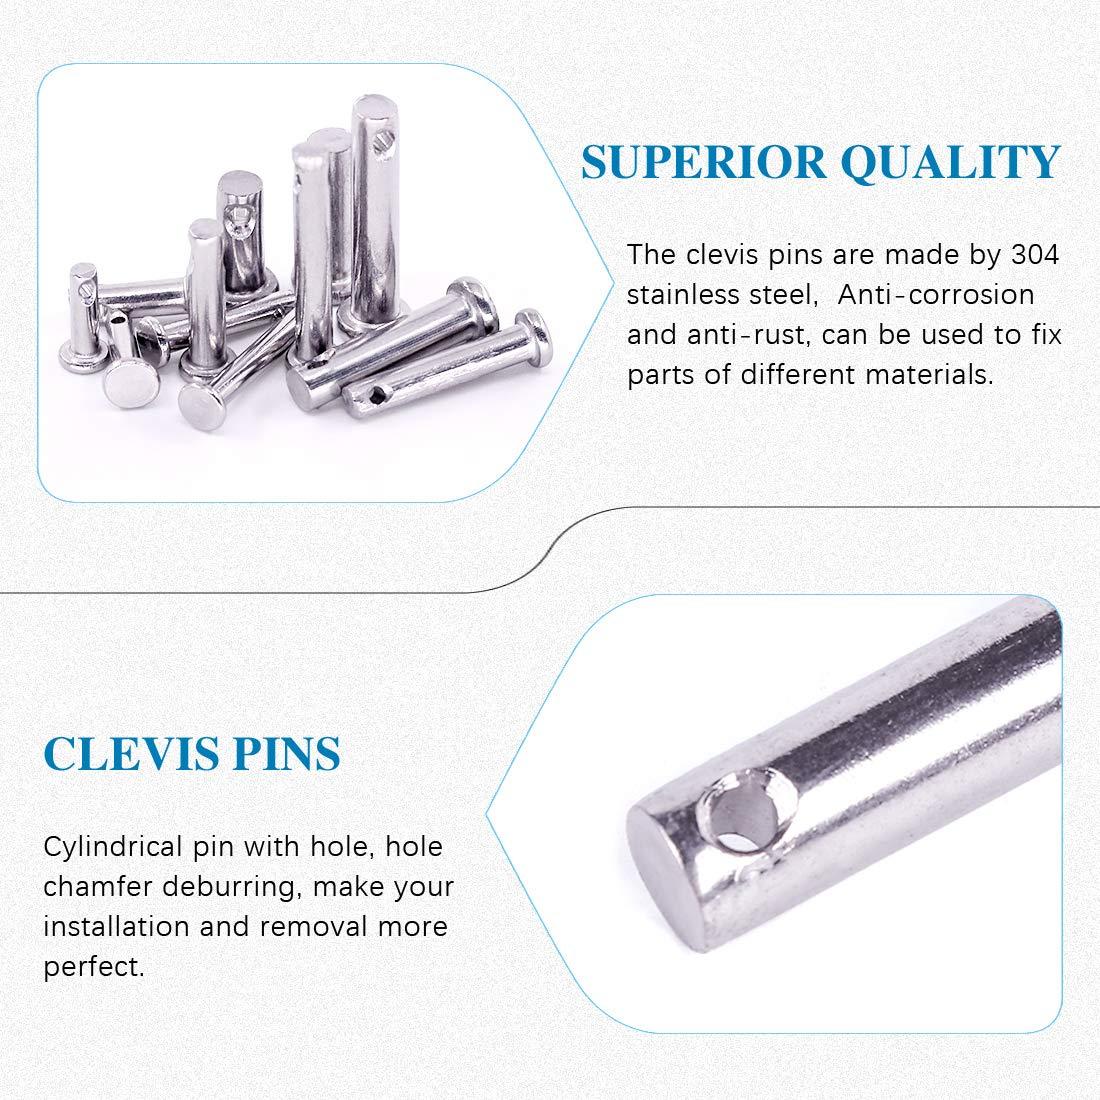 Glarks 64Pcs 12 Sizes 304 Stainless Steel Flat Head Single Hole Clevis Pins Assortment Kit